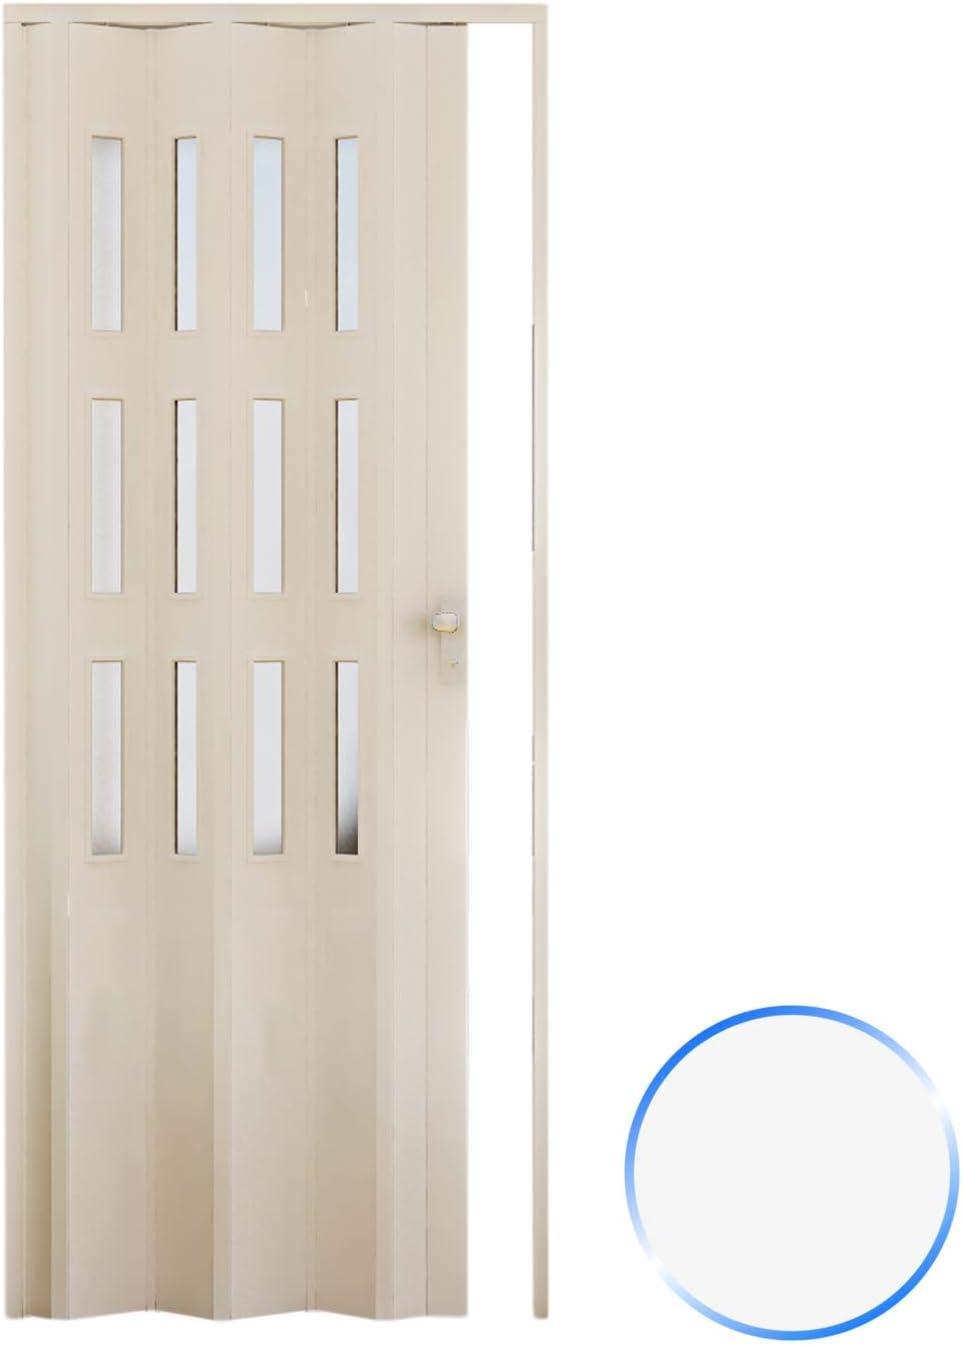 Forte Puerta Plegable de Interior de PVC 88,5x214 cm Blanco - Vidrio Satén Mod.Luciana